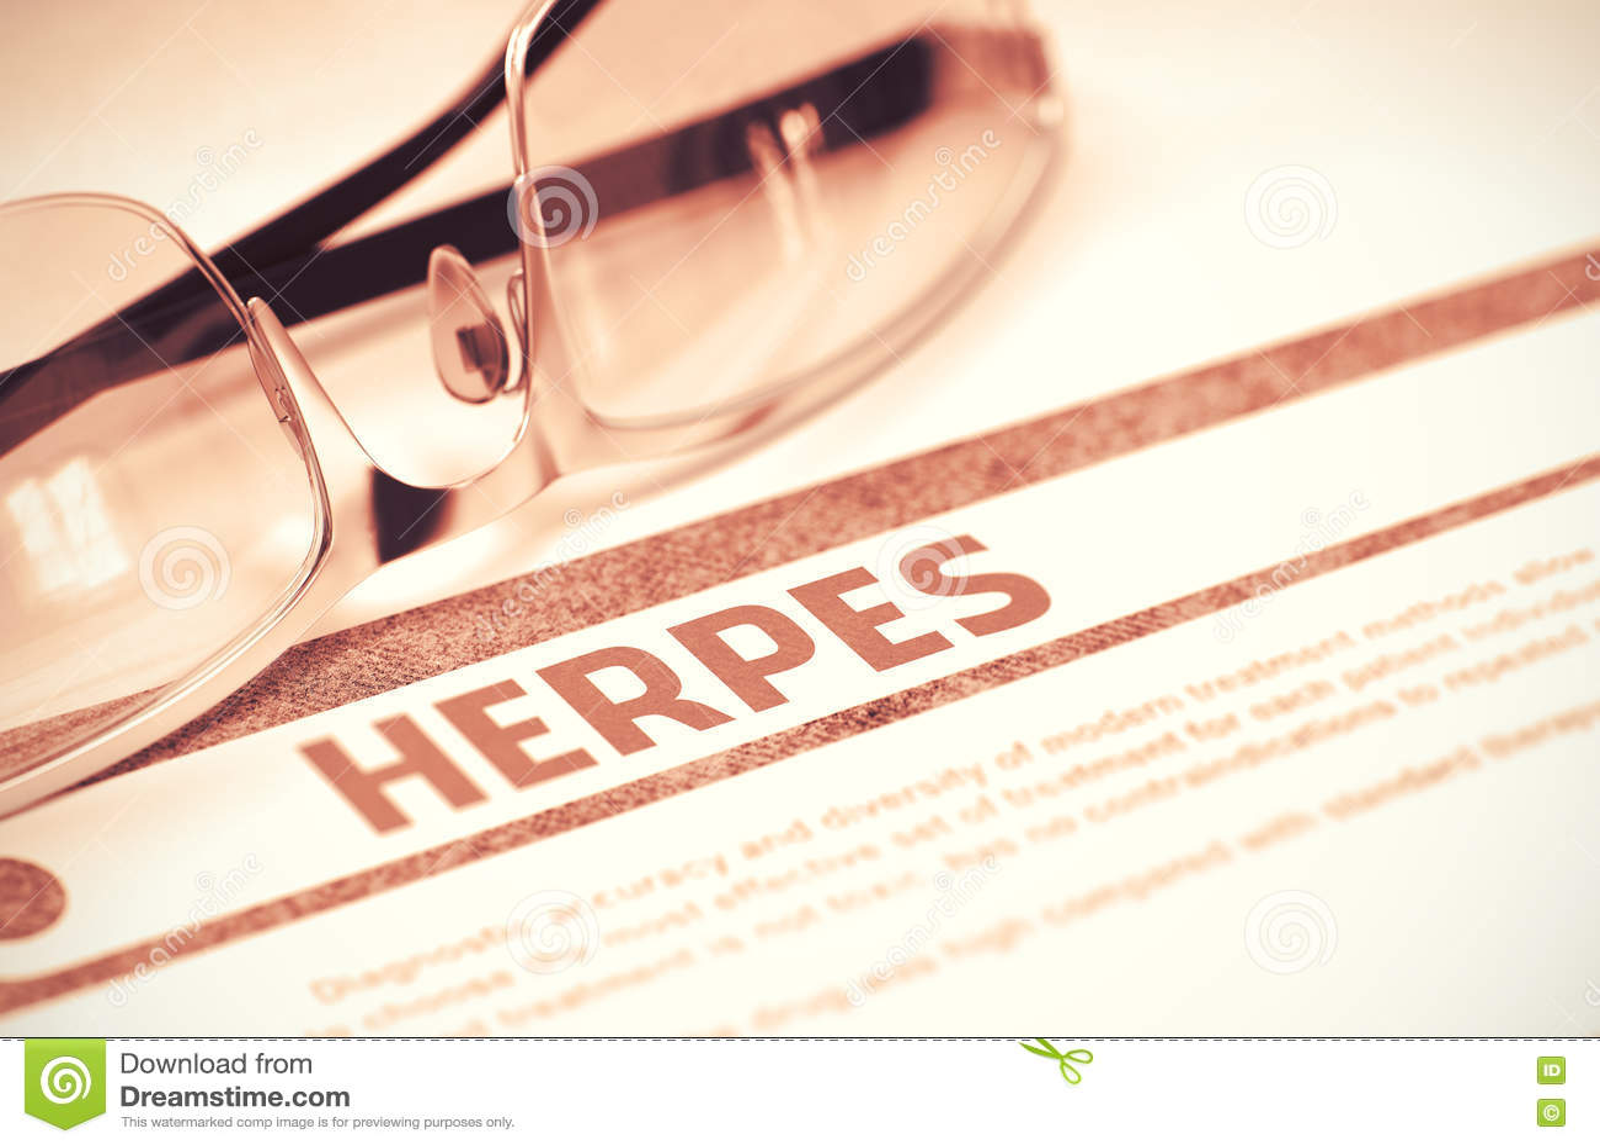 Structure Herpes Virus For Basic Medical Stock Vector ...  Herpes Medical Illustration